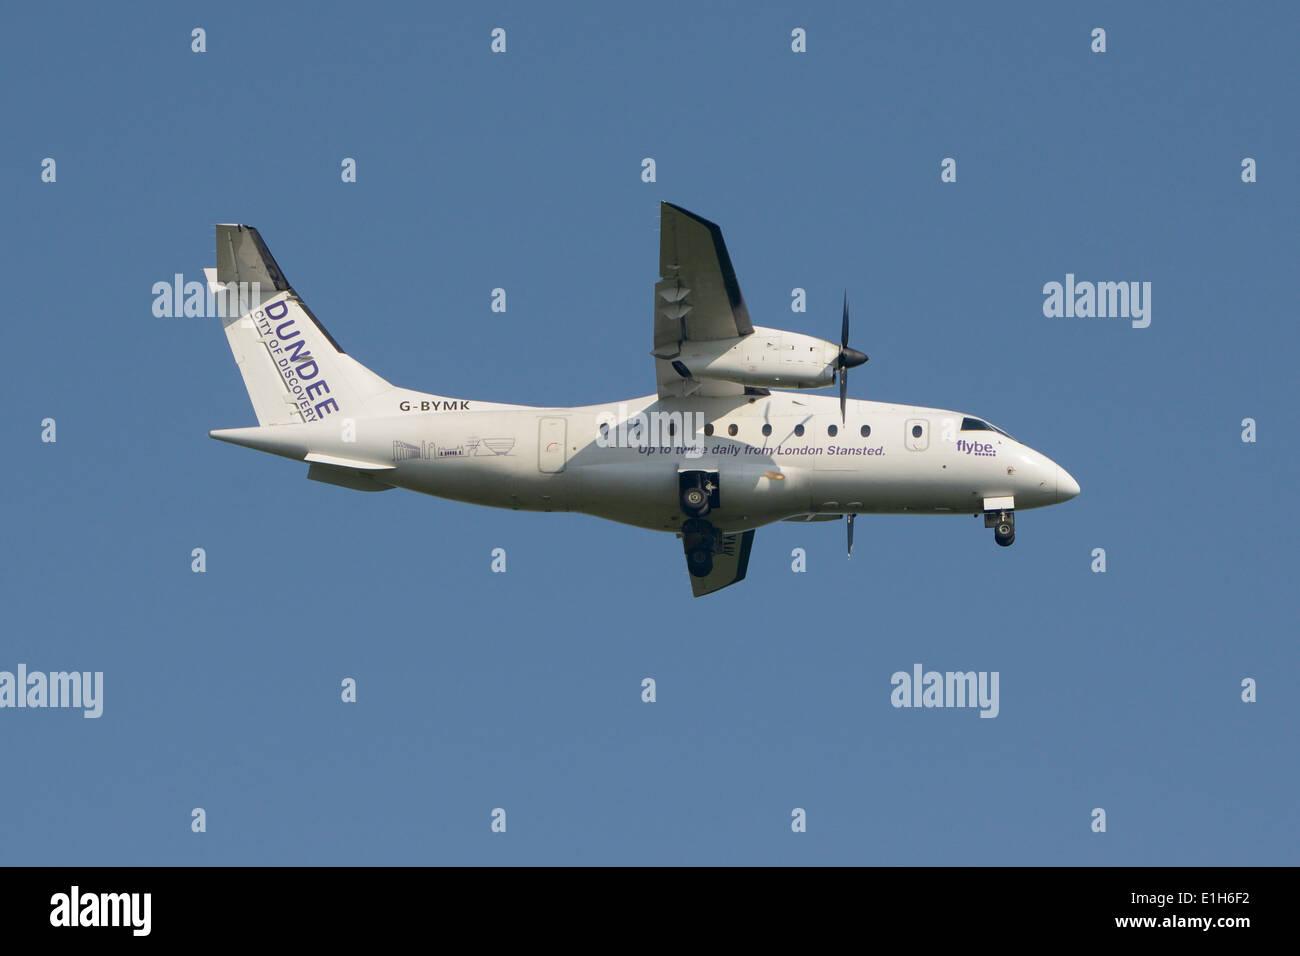 Flyebe (Scot Airways) Dornier 328-100 on final approach - Stock Image